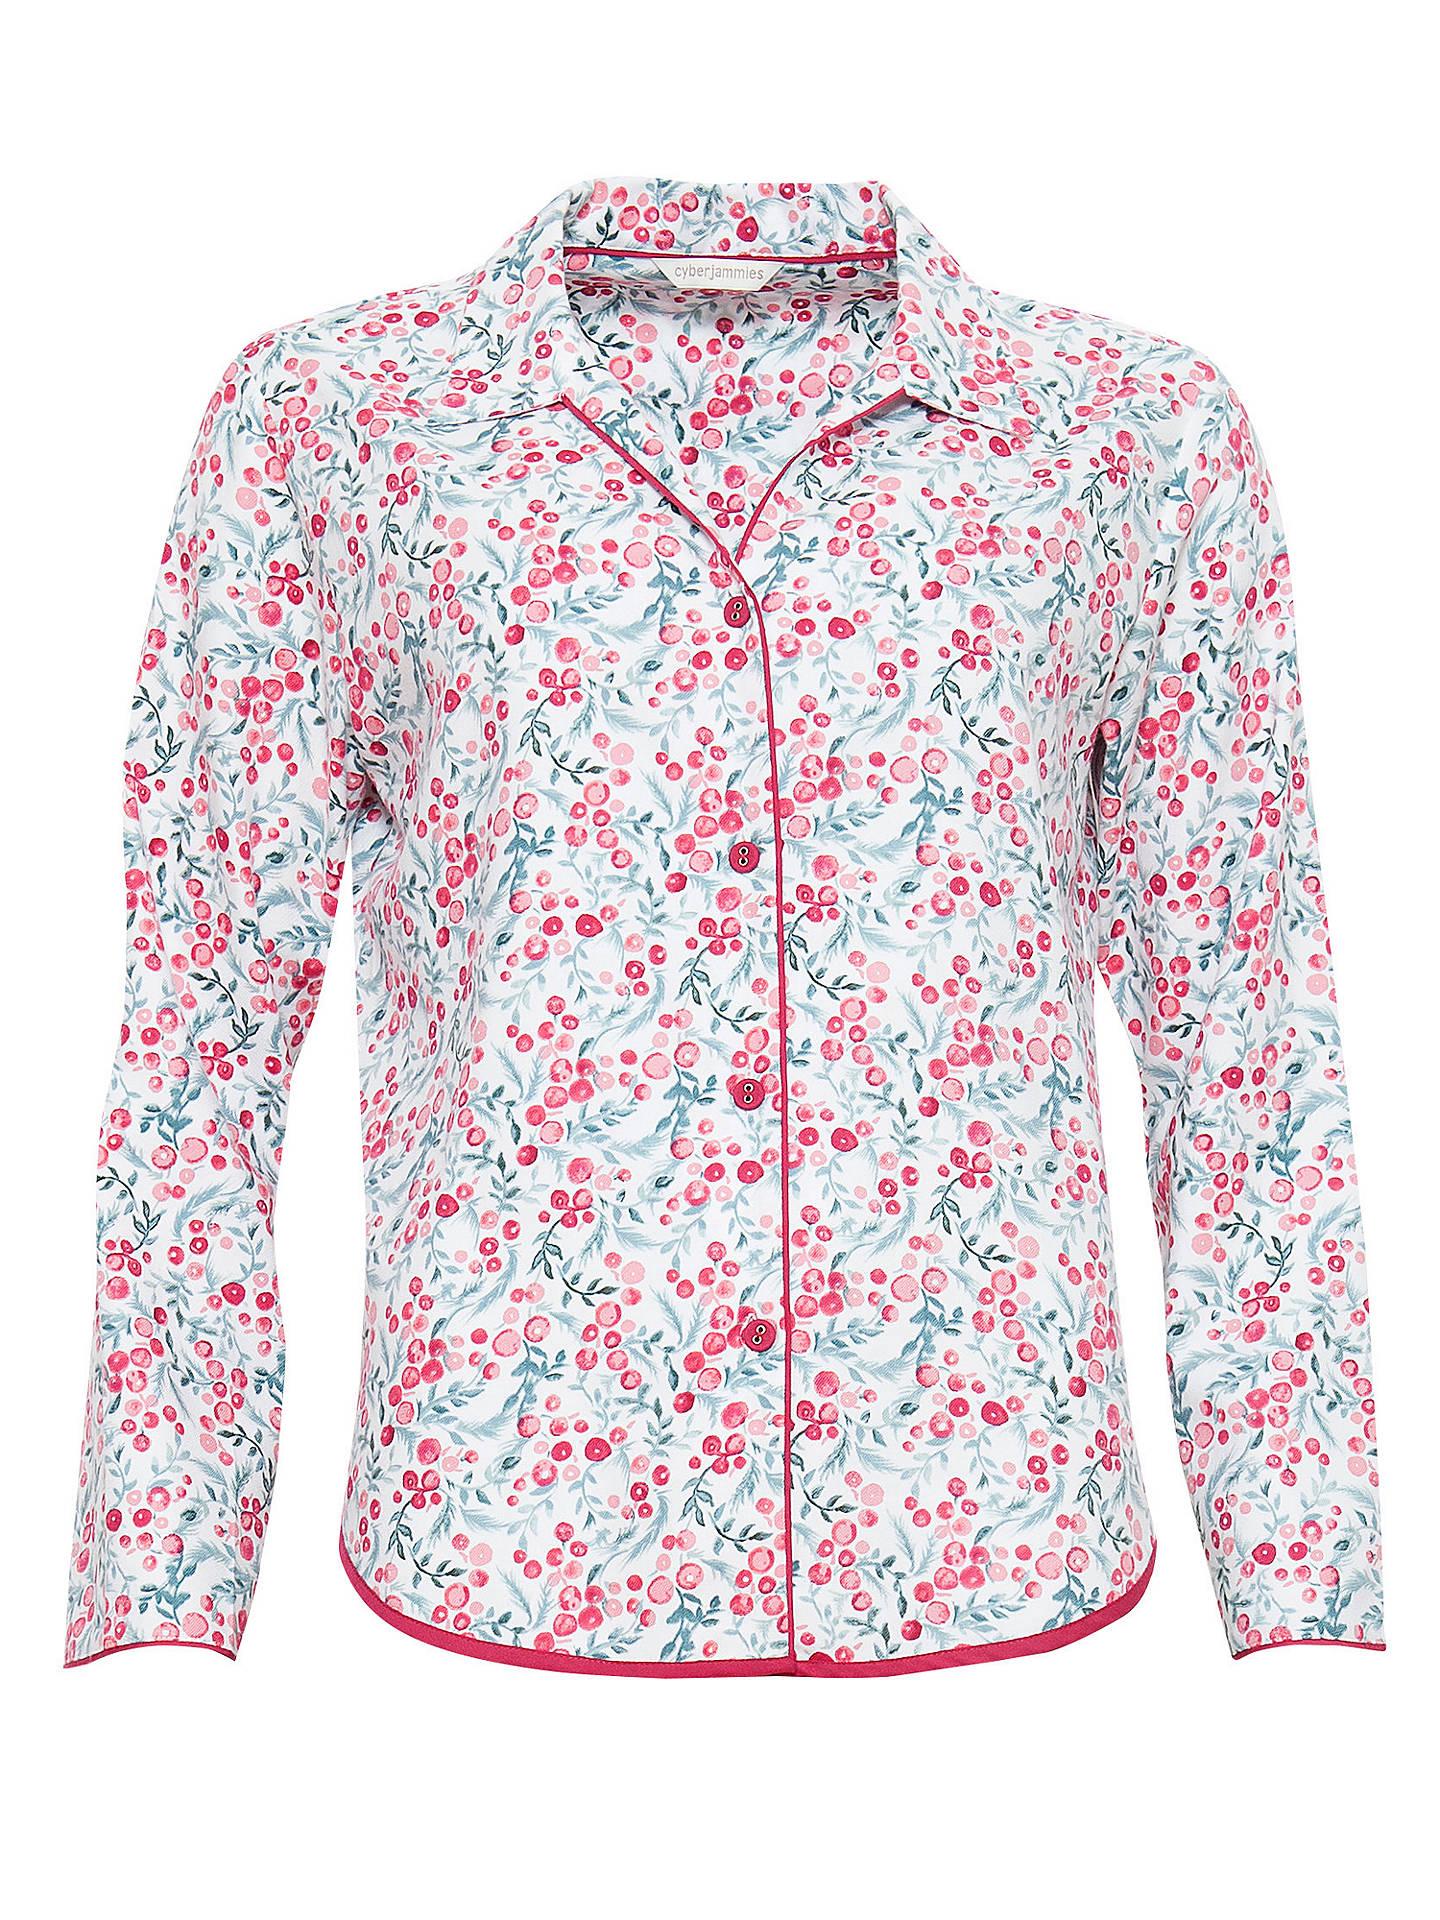 84a9c78ff Cyberjammies Holly Berry Pyjama Set